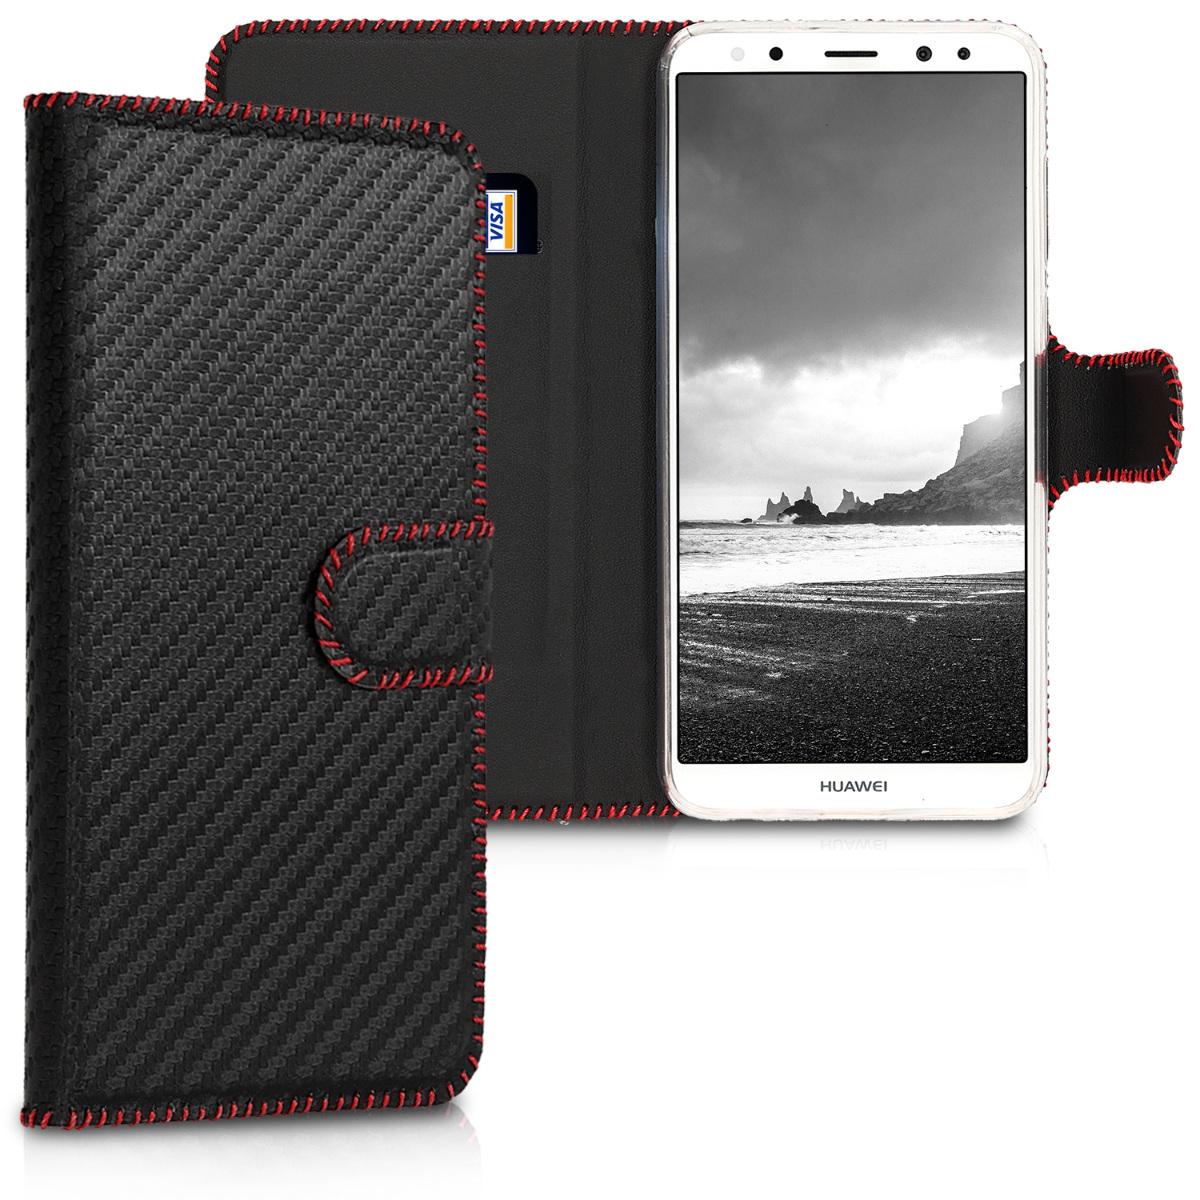 KW Θήκη - Πορτοφόλι Huawei Mate 10 Lite - Black / Red Carbon (44719.02)